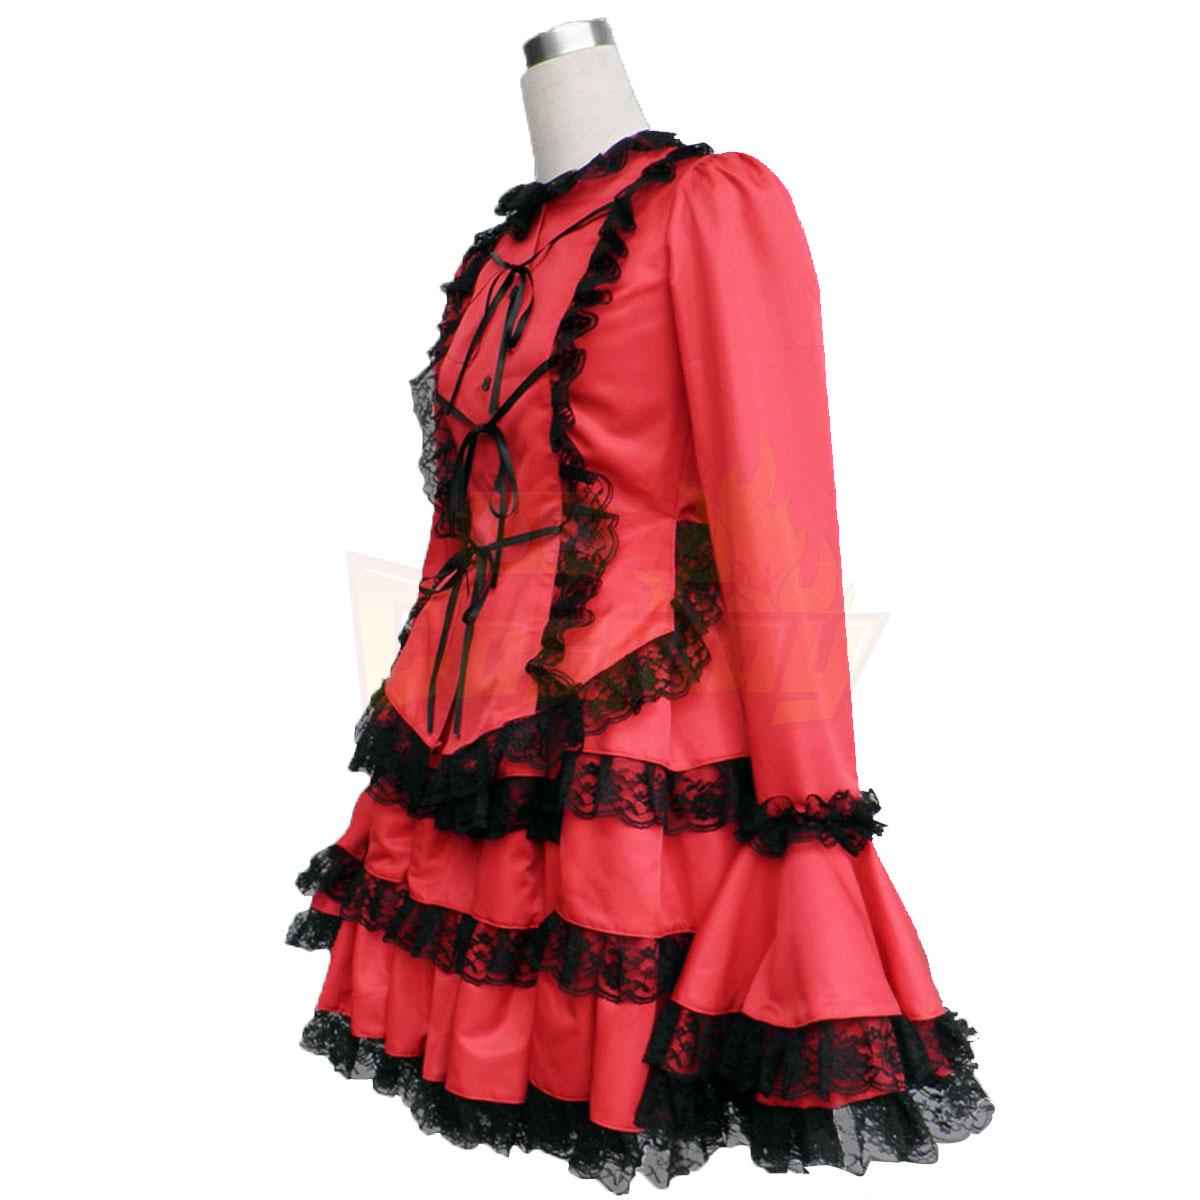 Fantasias Cultura Lolita Coat Tire Vermelho Vestidos Média Trajes Cosplay